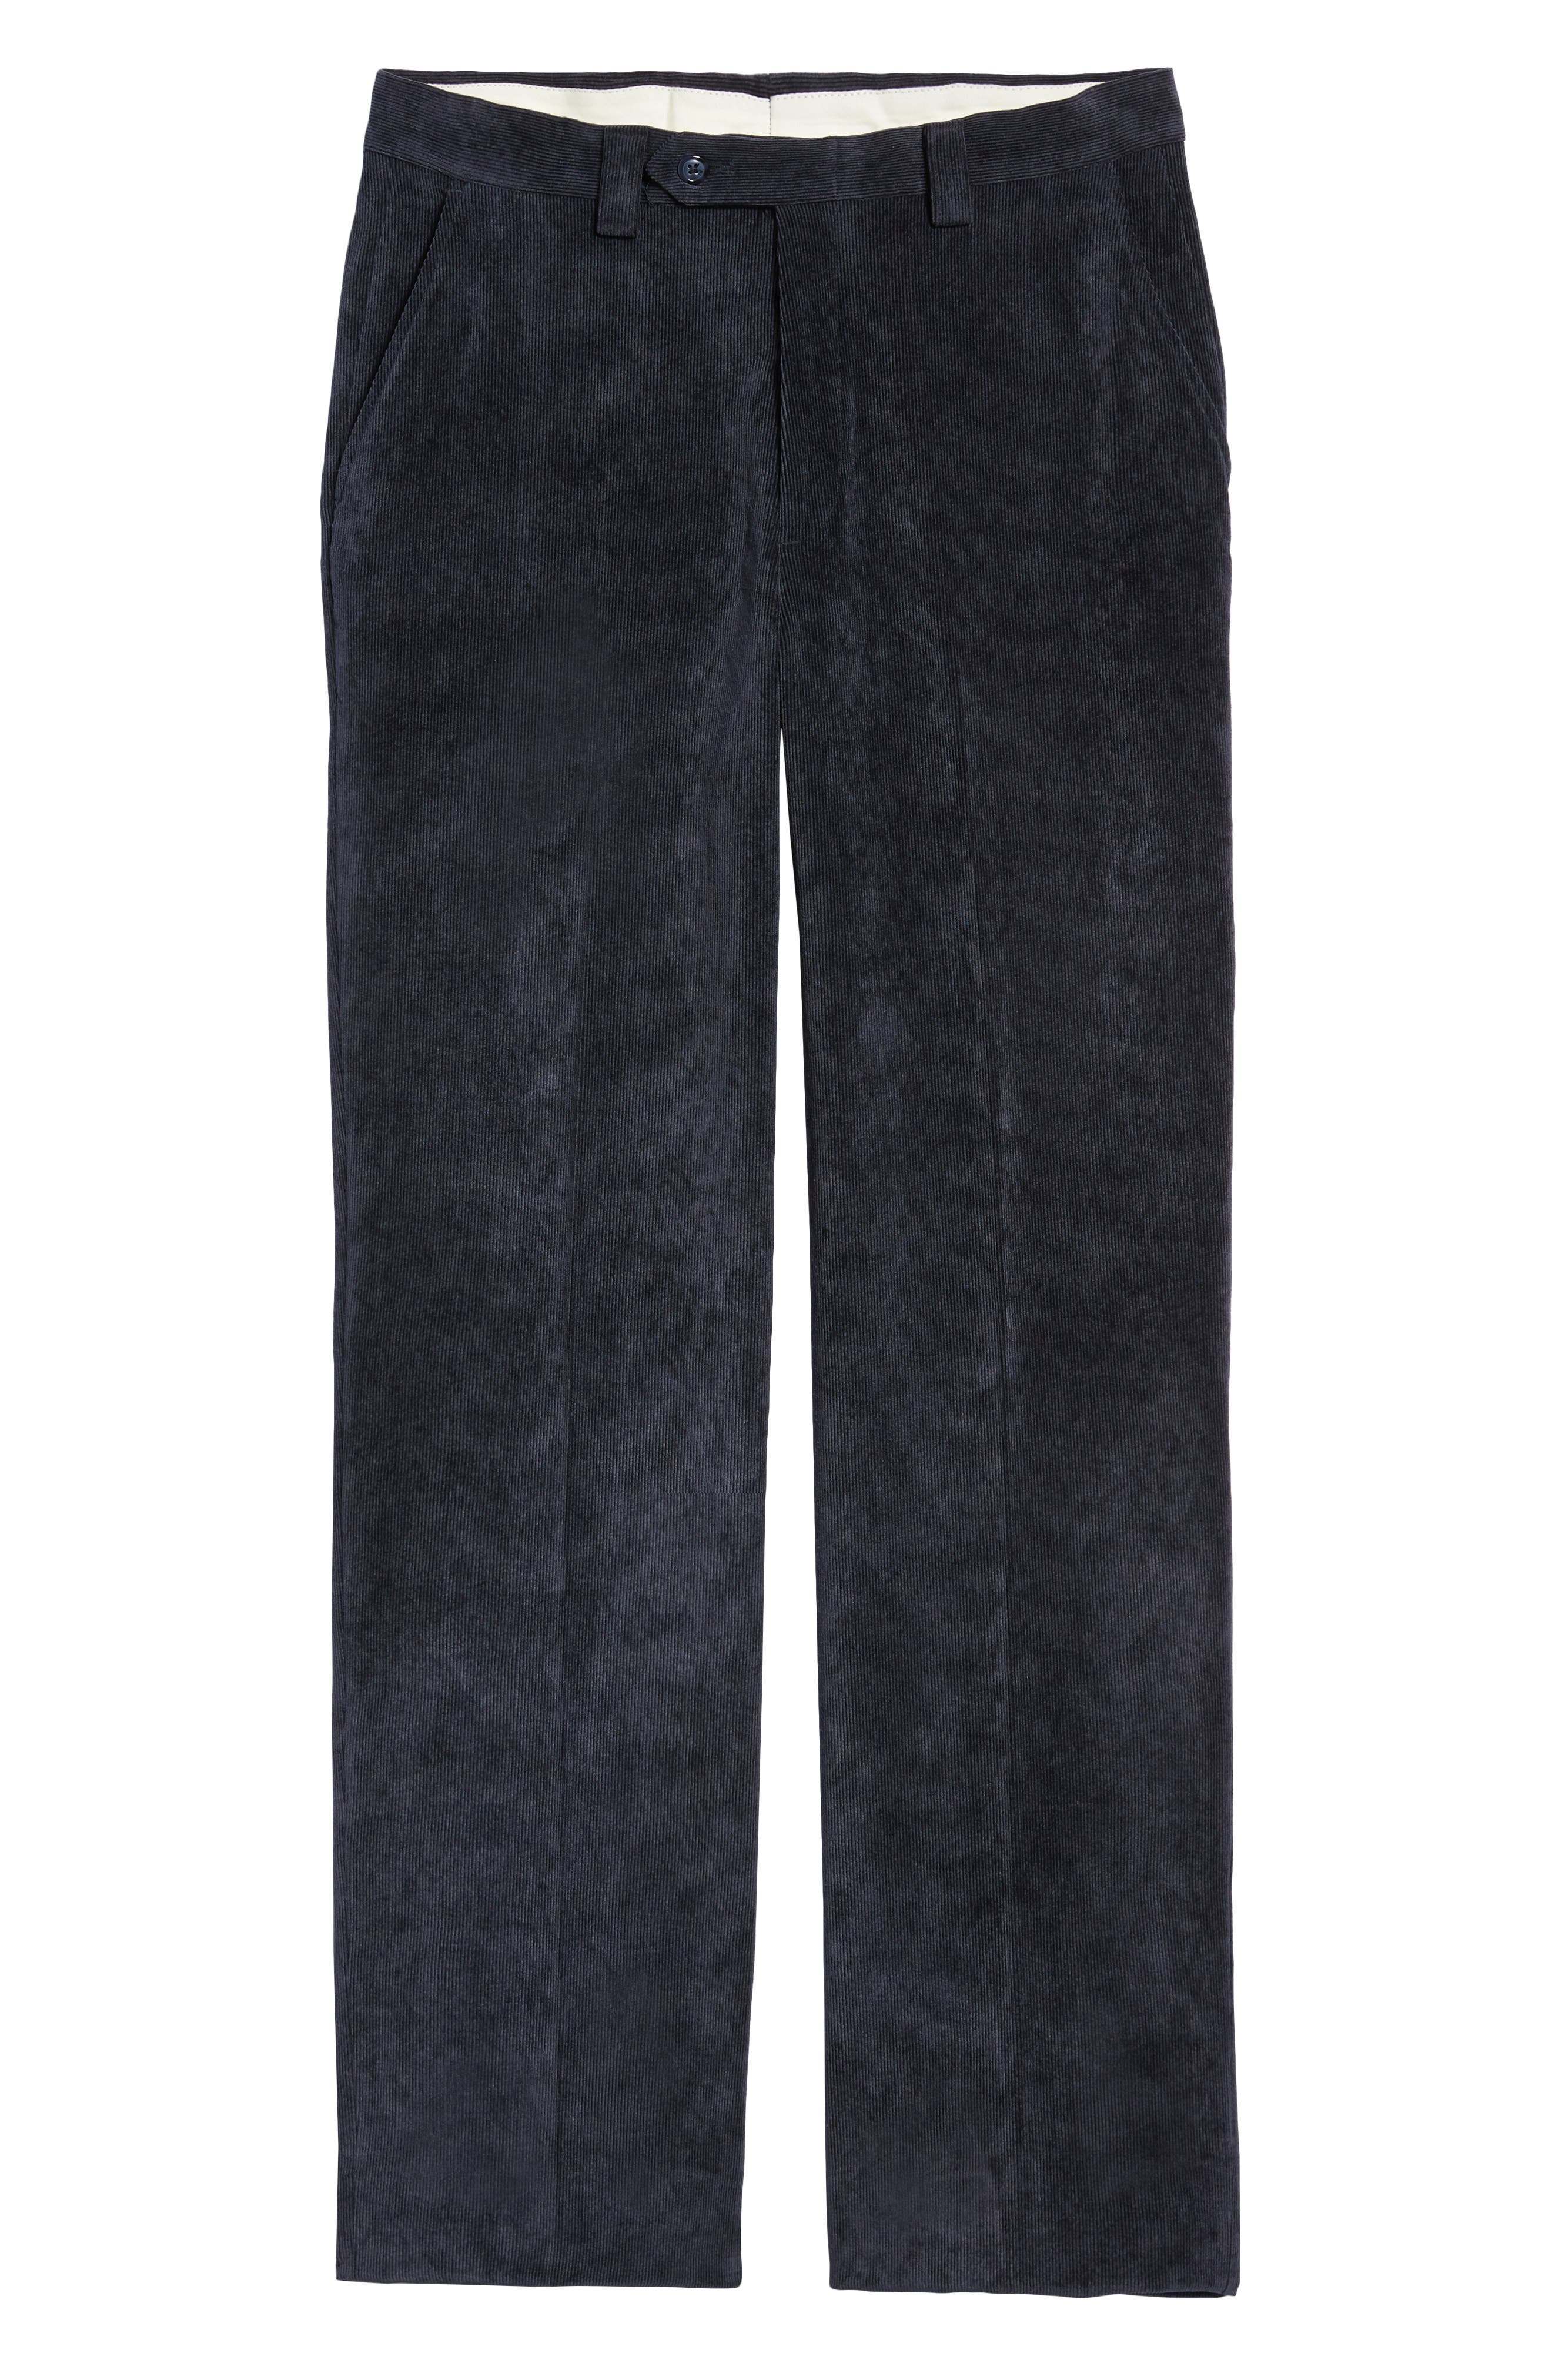 BERLE,                             Classic Fit Flat Front Corduroy Trousers,                             Alternate thumbnail 6, color,                             410